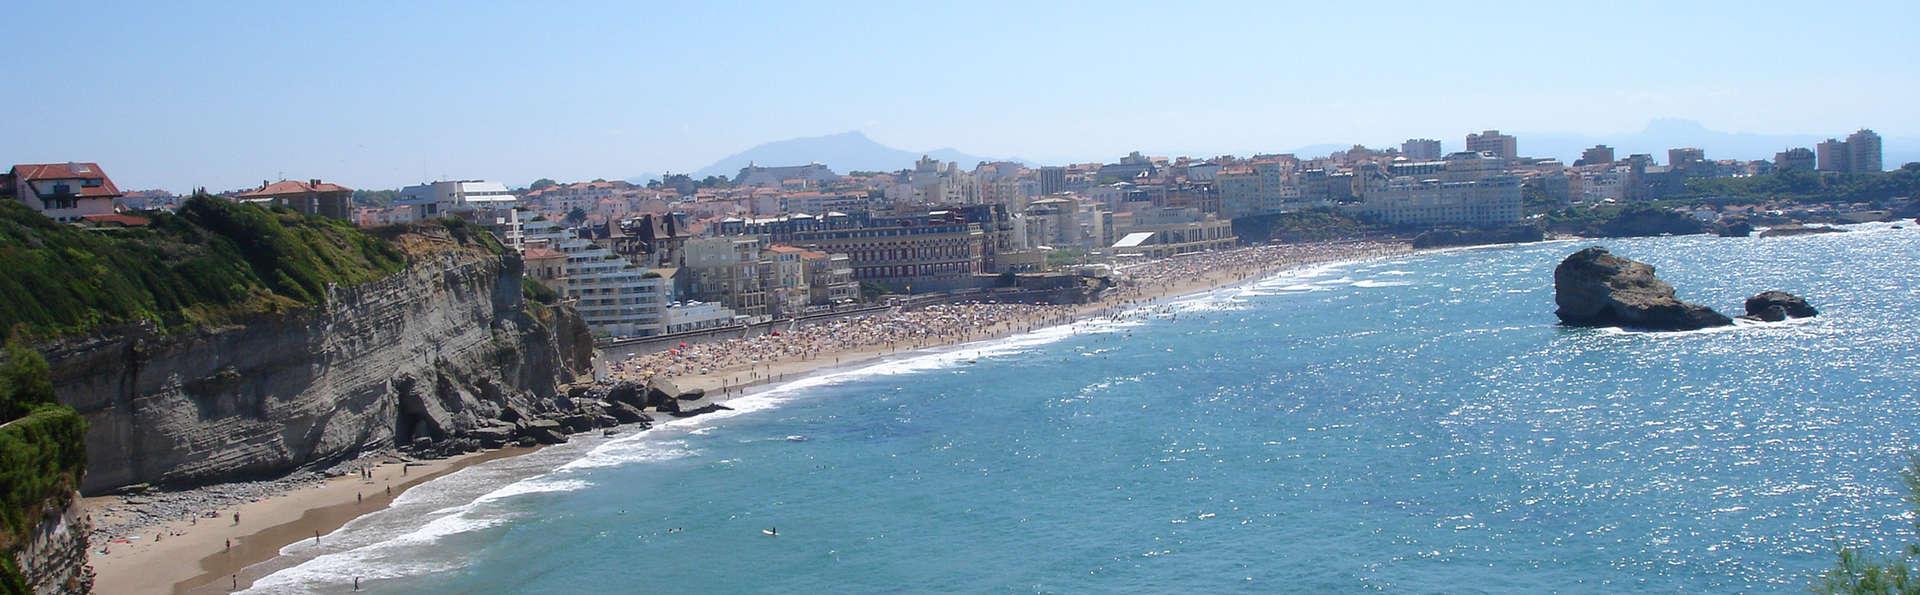 Radisson Blu Hotel Biarritz - edit_biarritz1.jpg